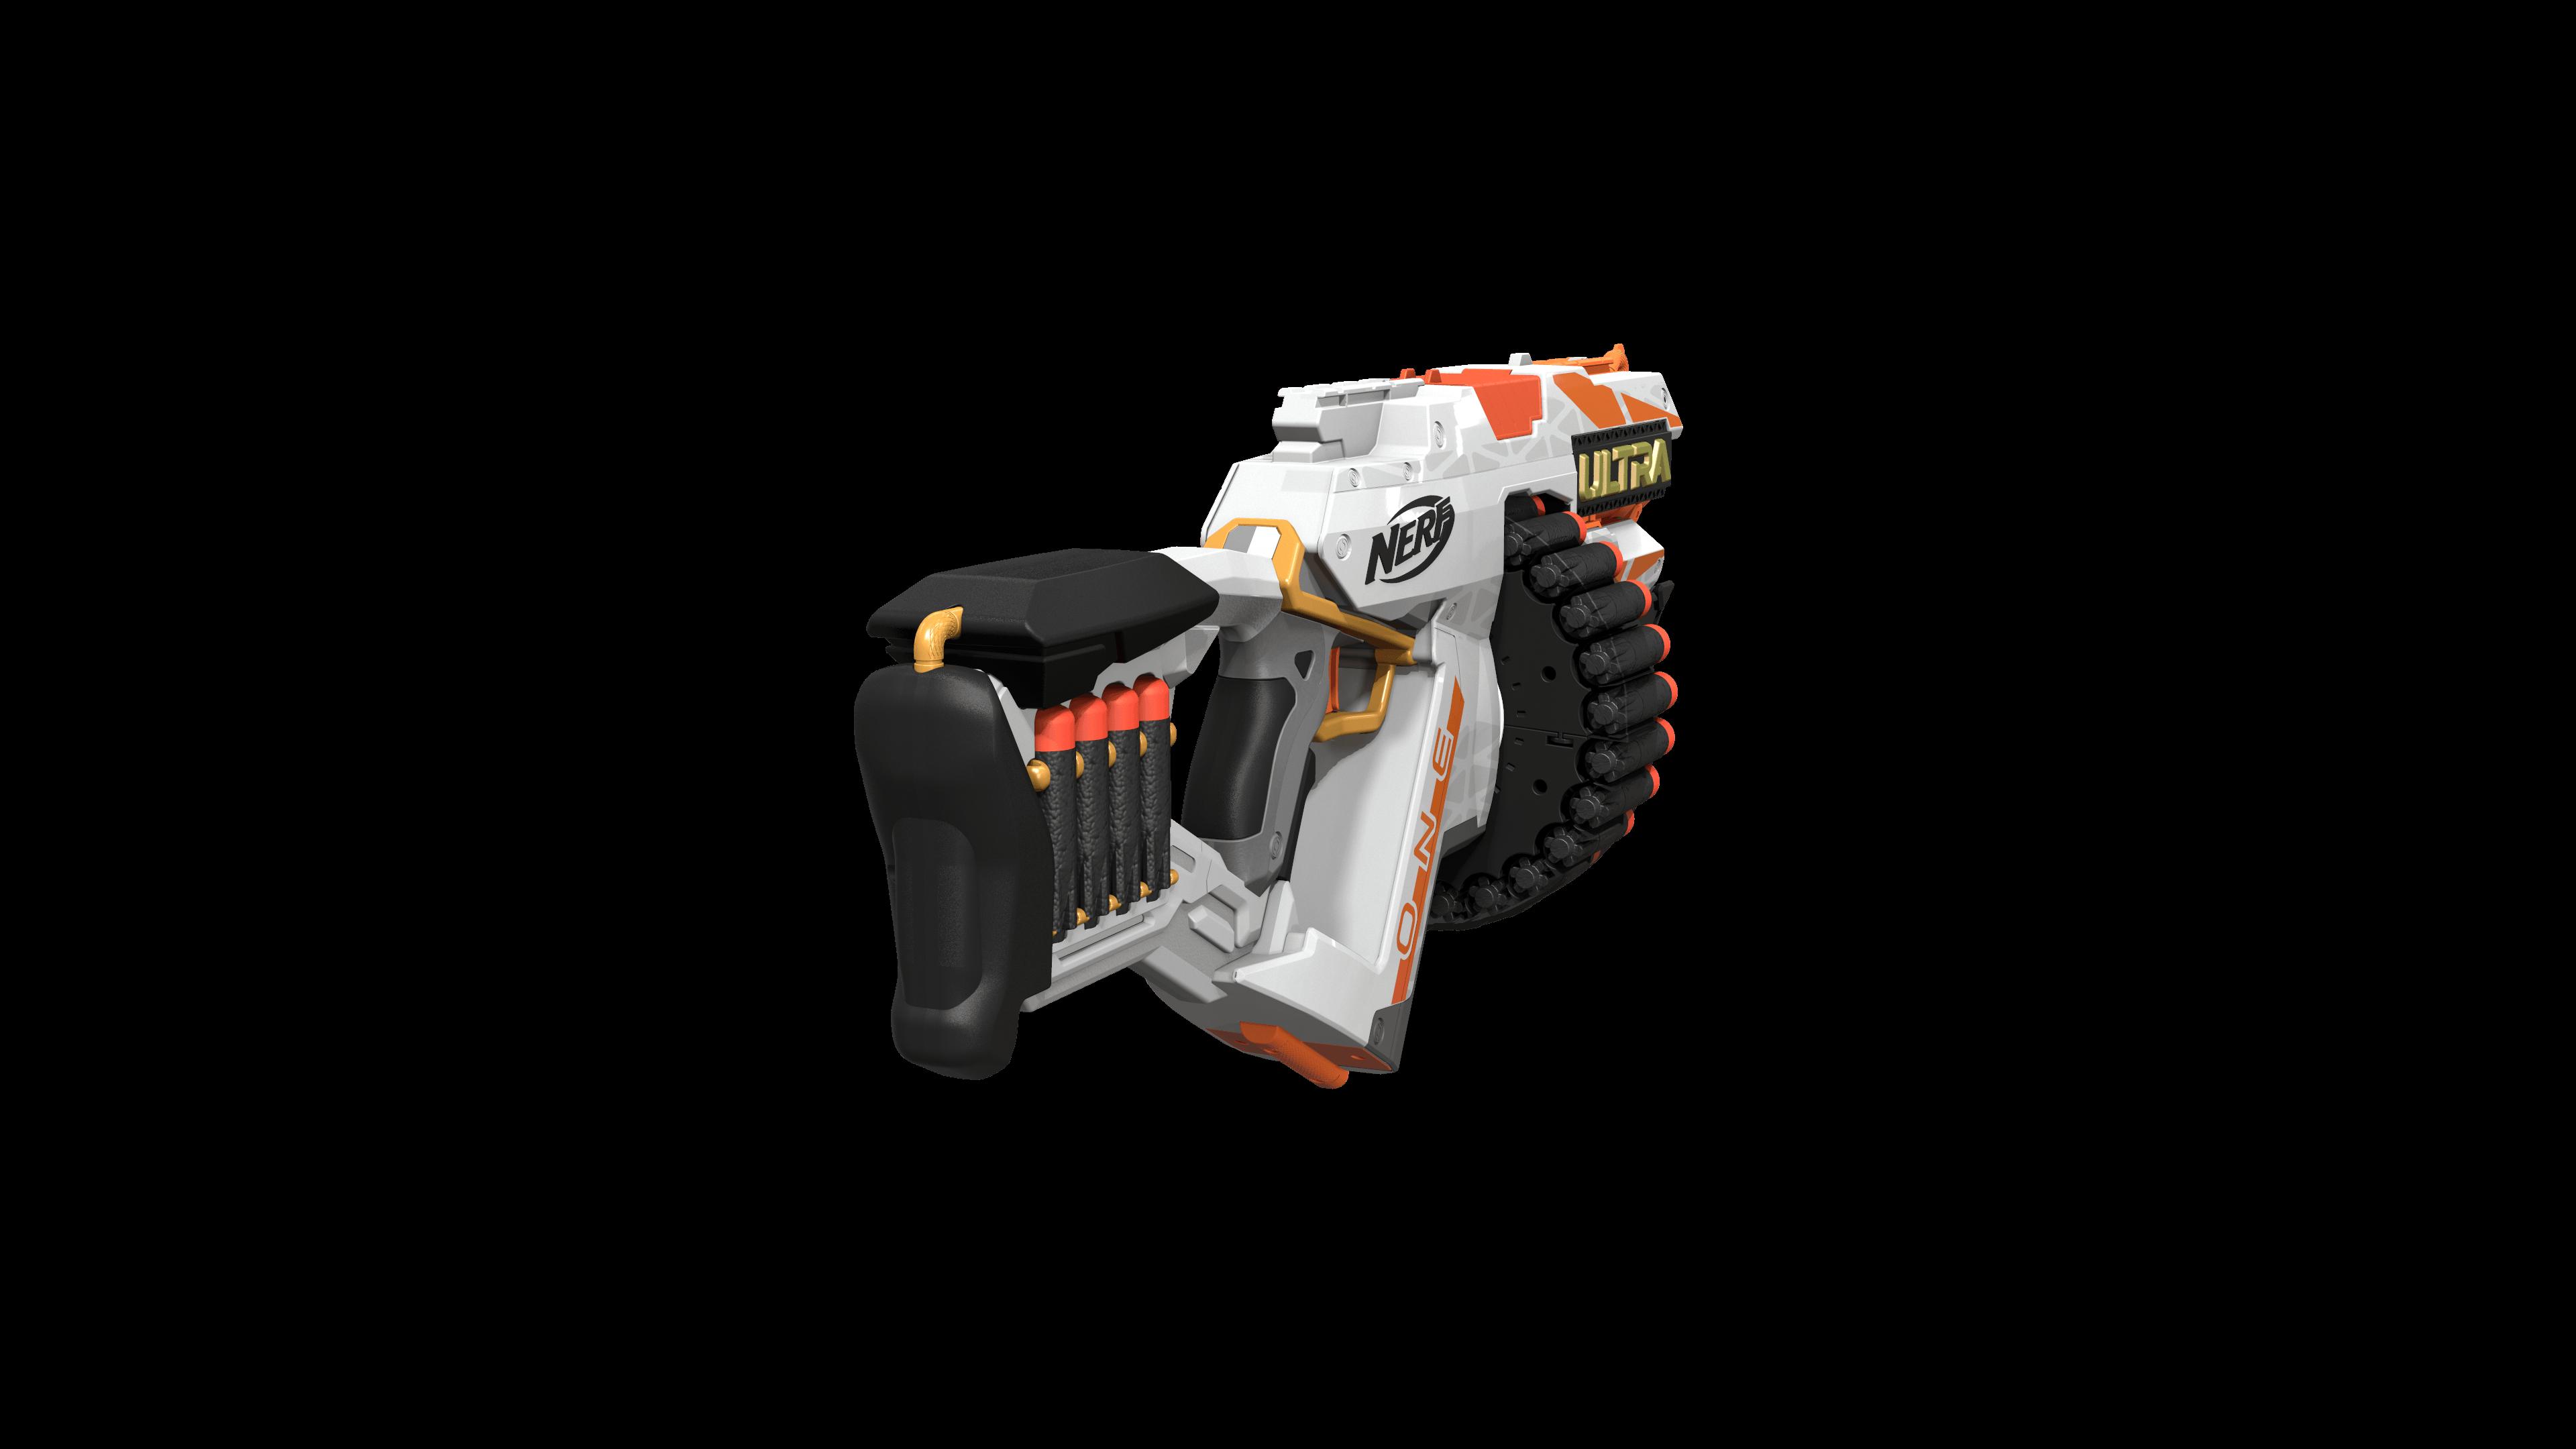 ultra blaster img 24